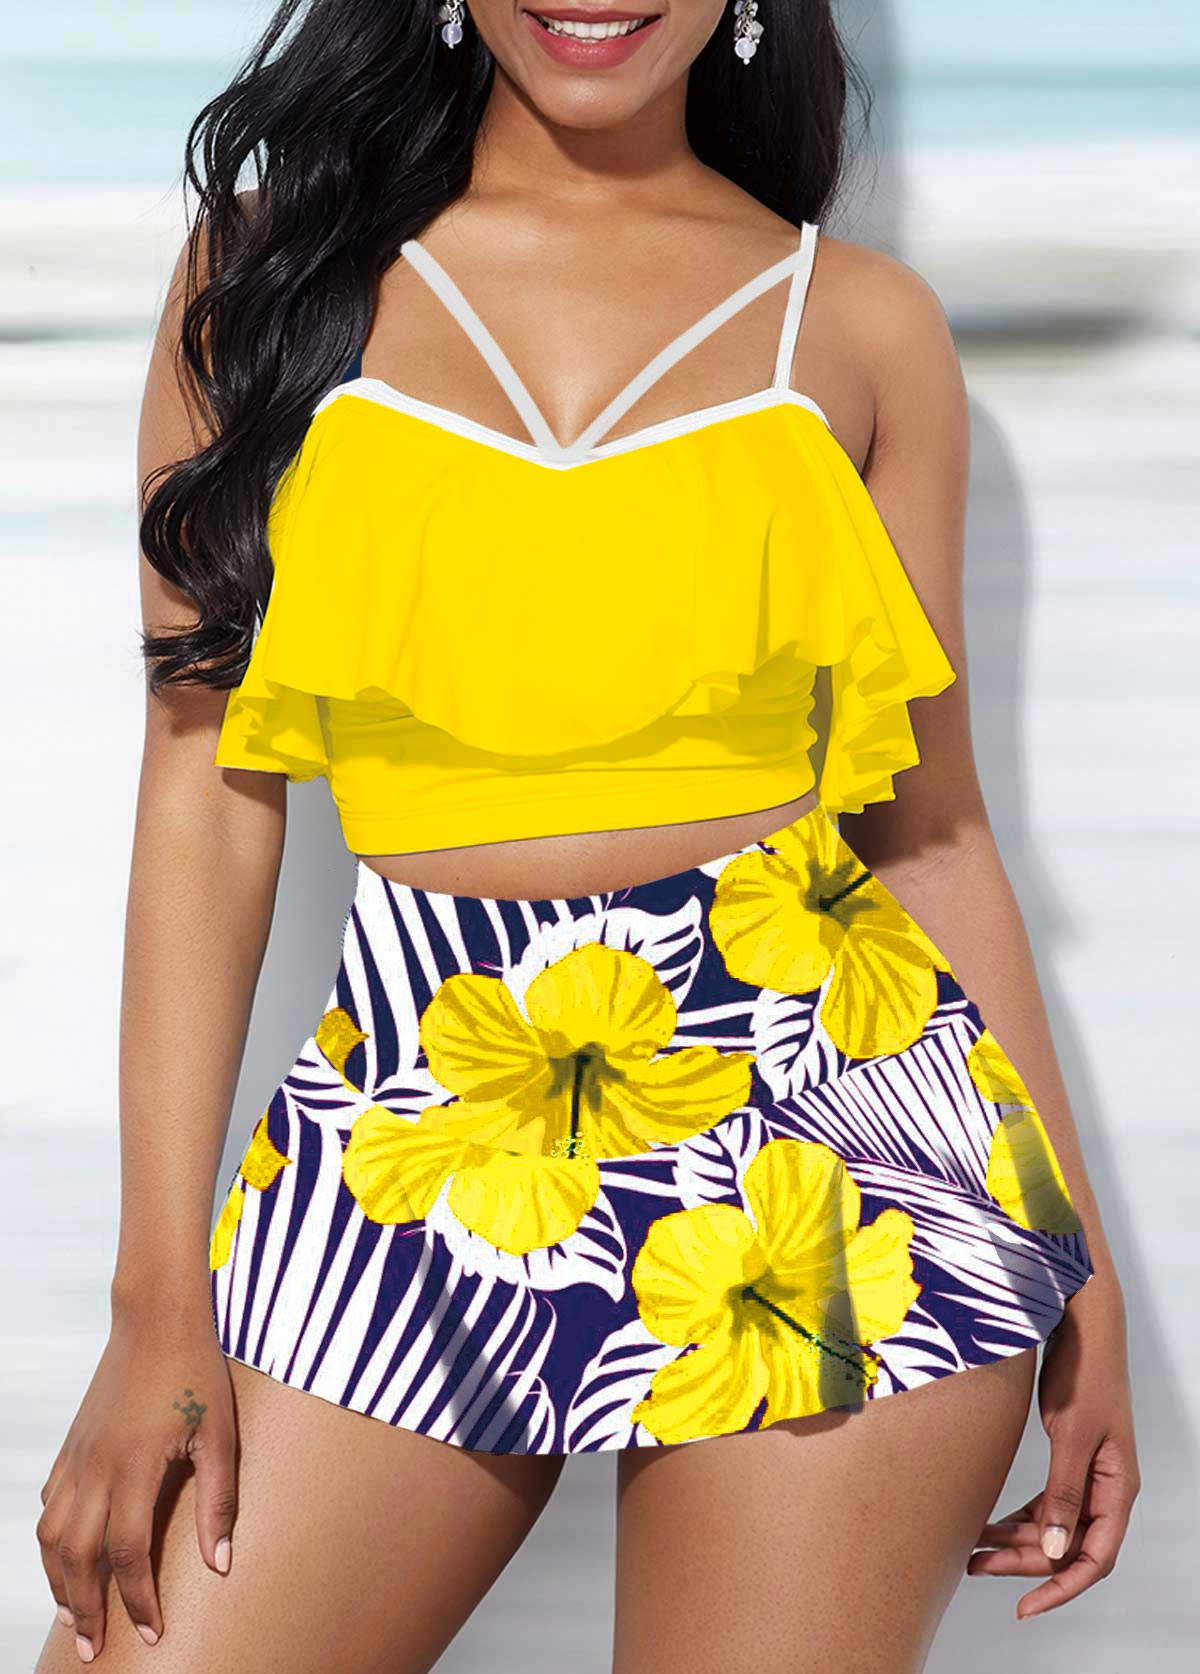 ROTITA Spaghetti Strap Swimwear Top and Floral Print High Waisted Pantskirt